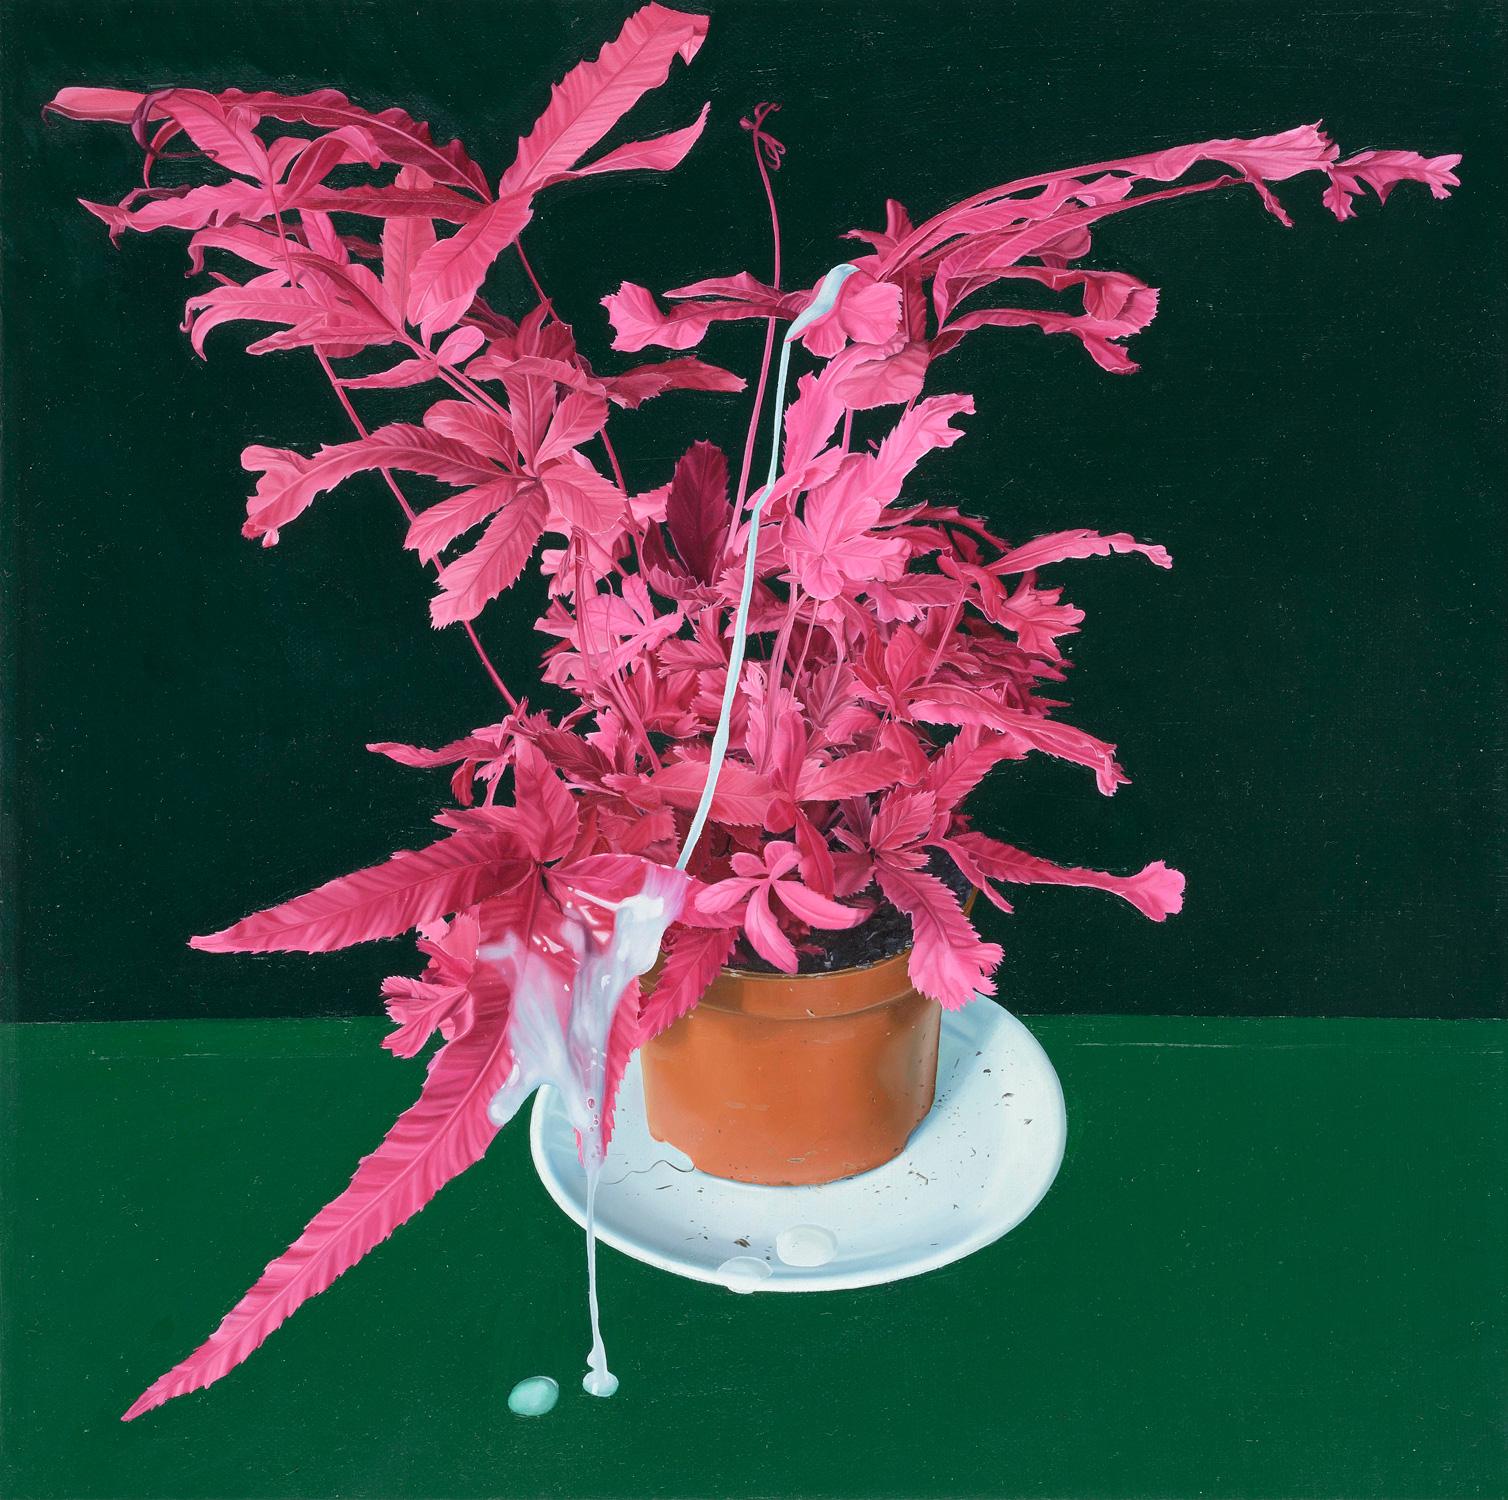 Tristan Pigott   Misfired Shot at Nature Morte,   Oil on linen  20 x 20 cm